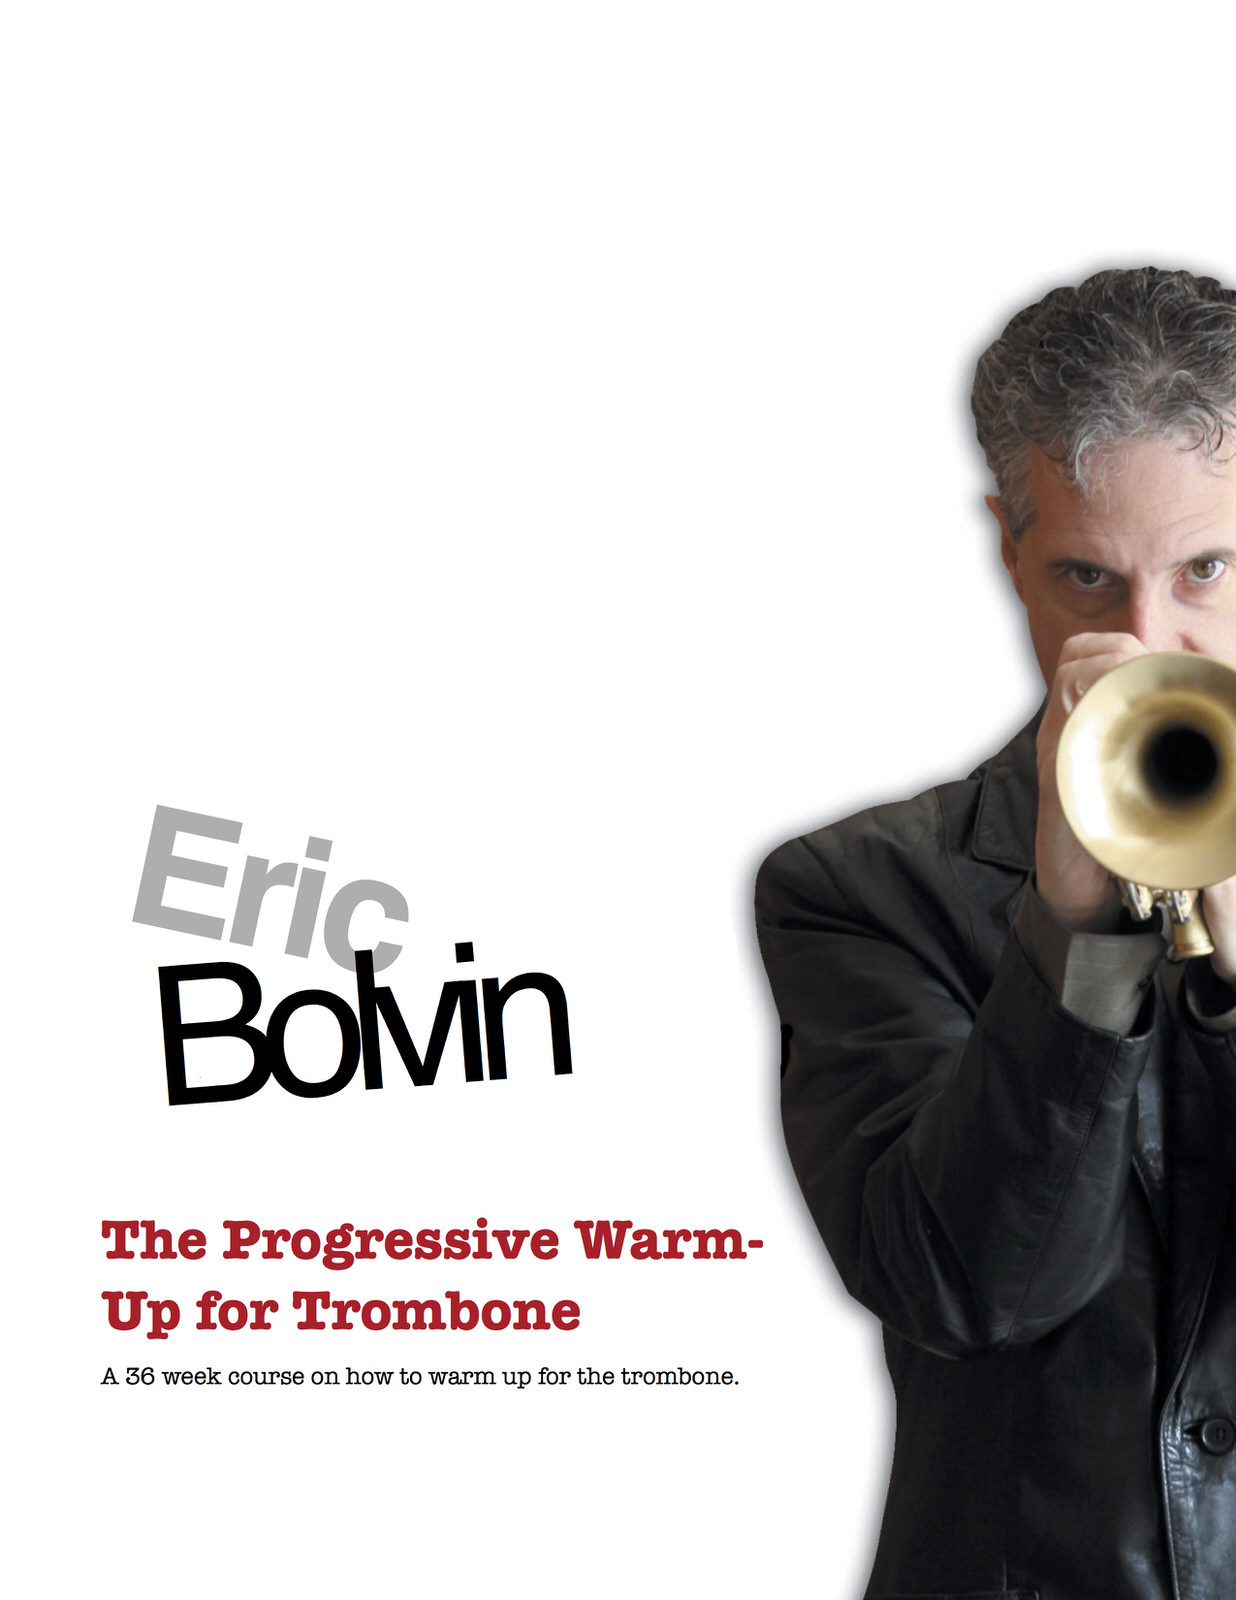 Bolvin, The Progresive Warm Up trombone